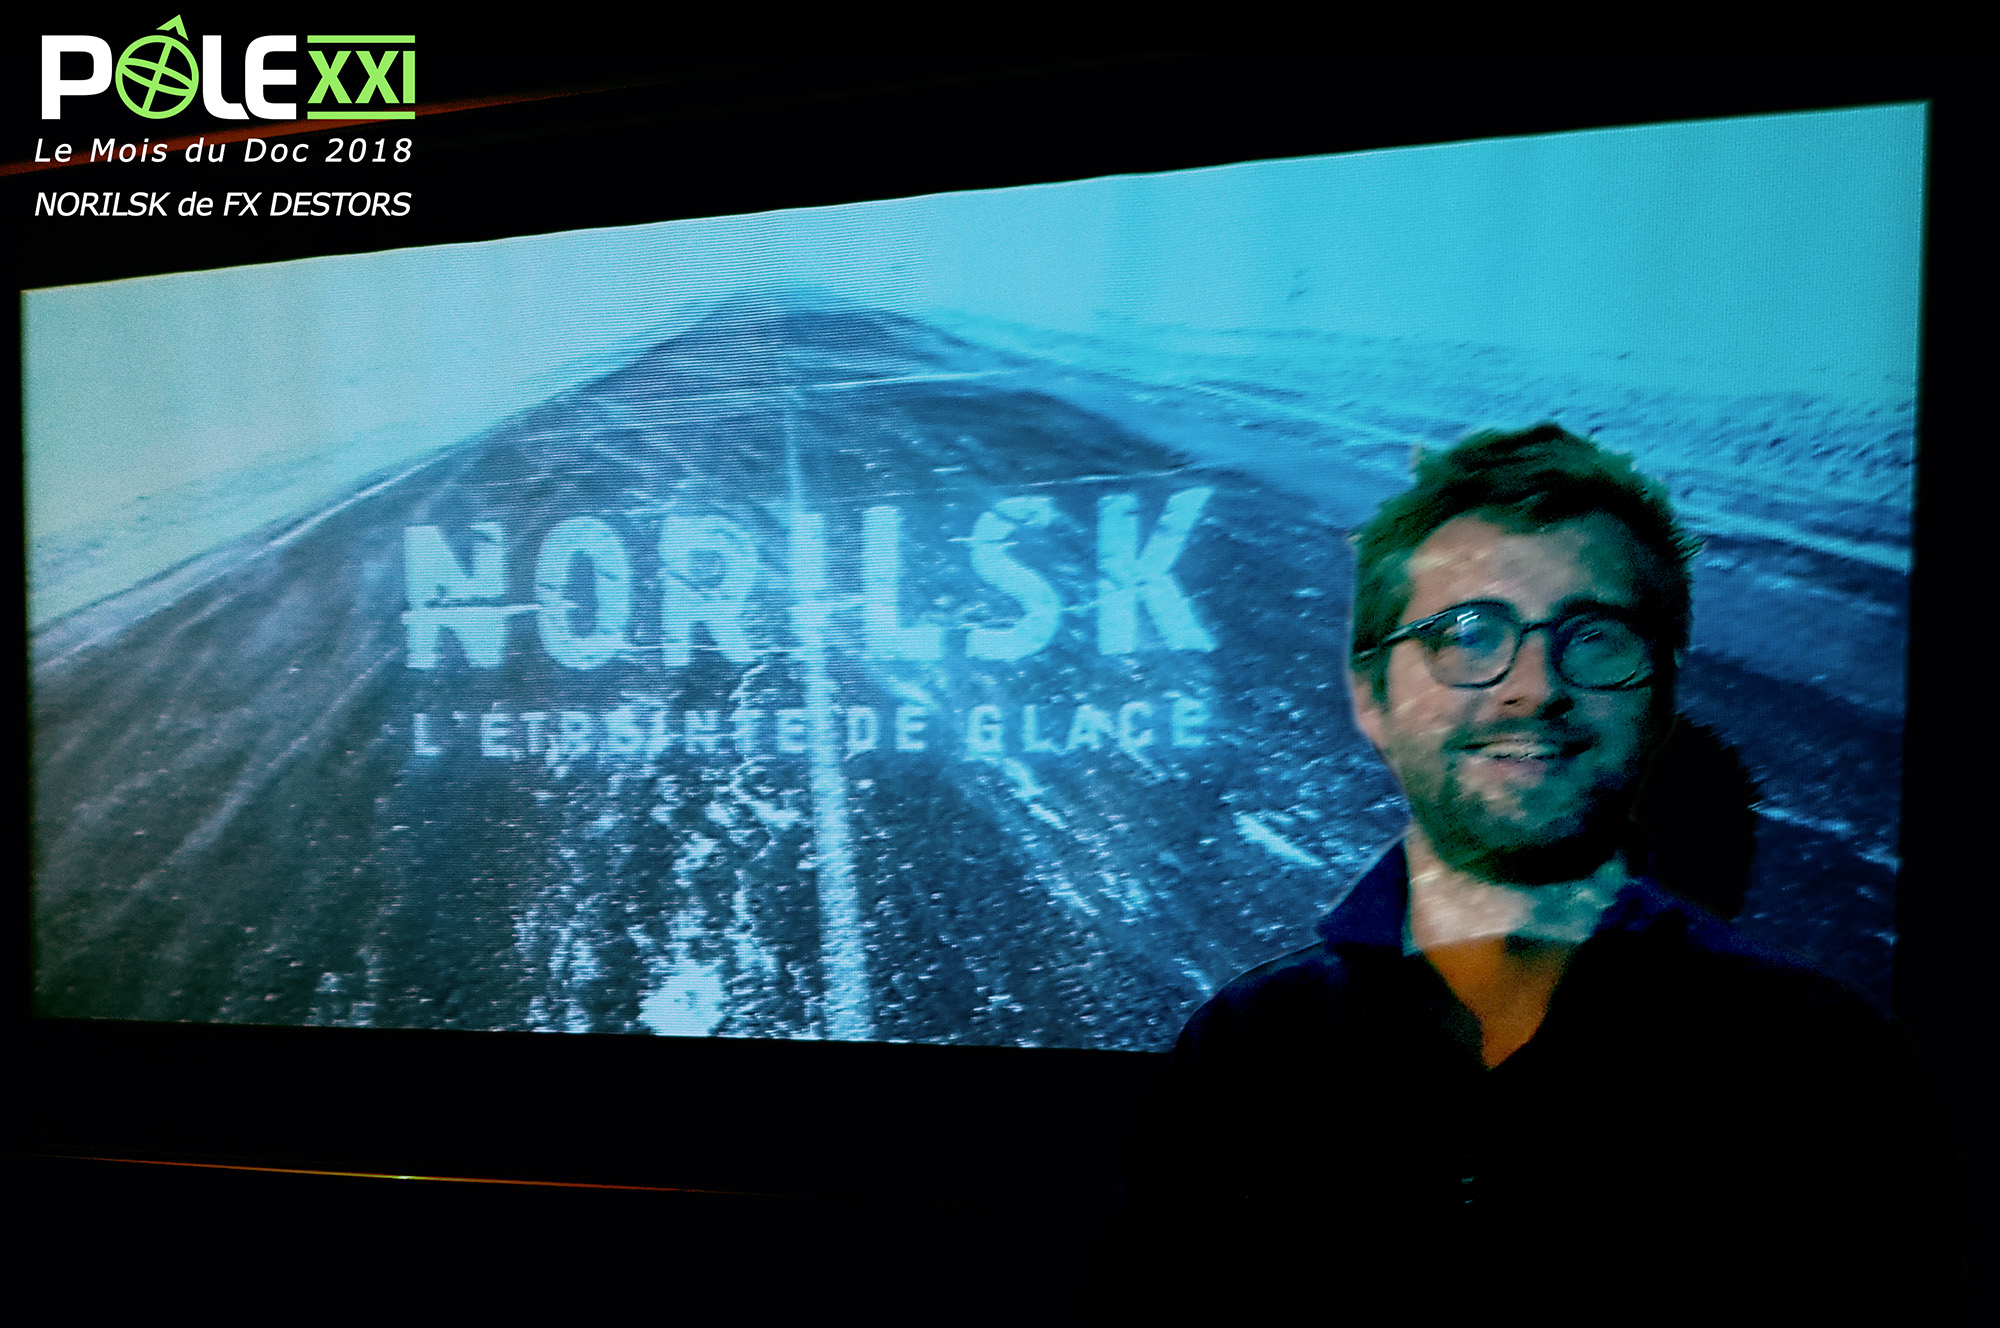 Norilsk_polexxi_light_fb